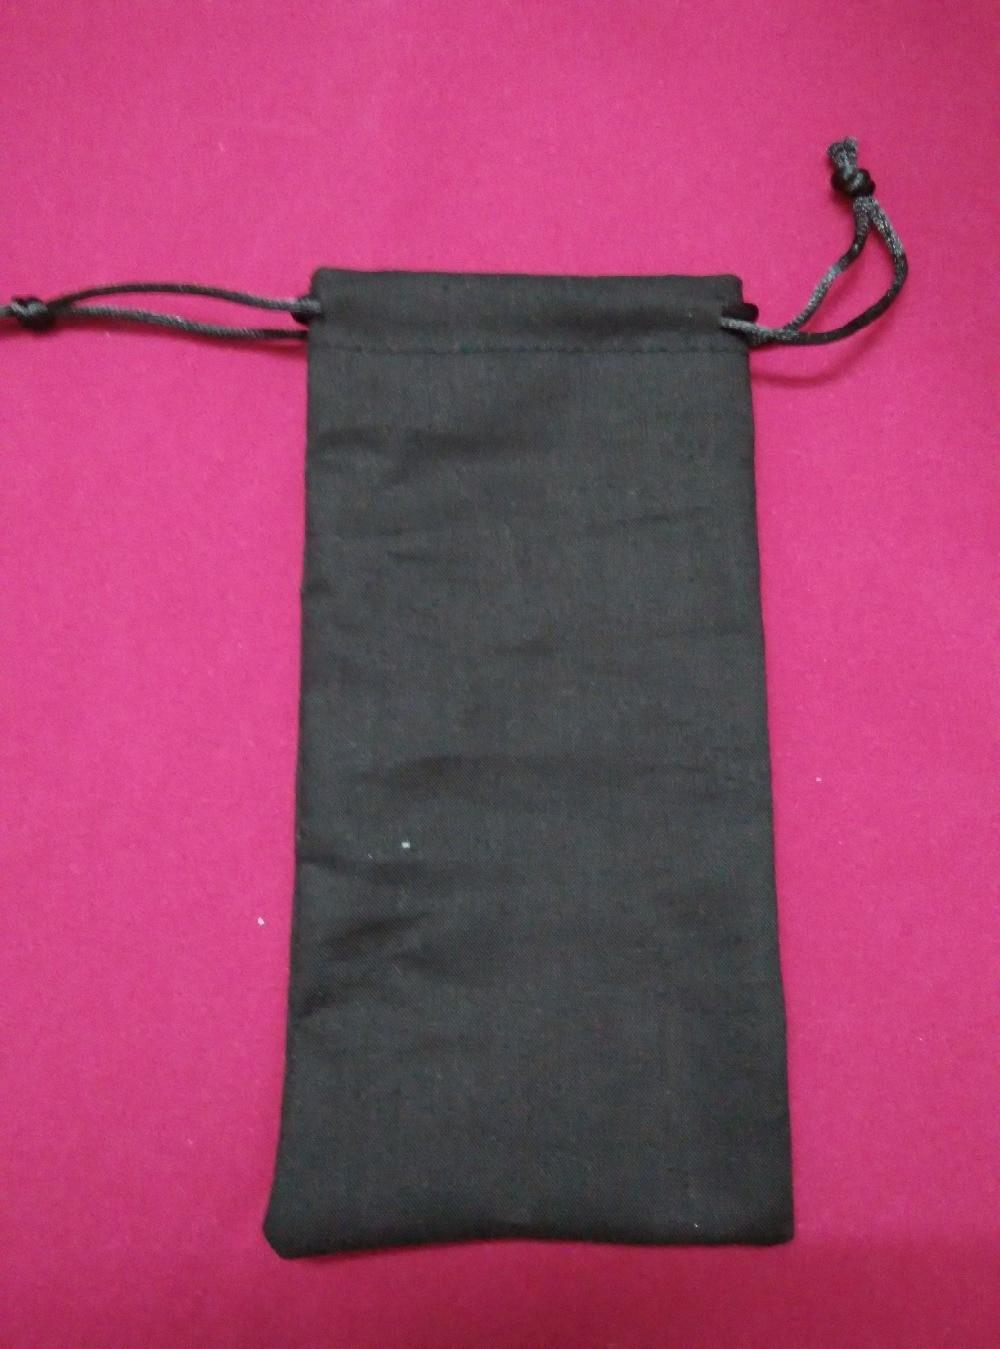 100pcs/lot free shipping small cotton jewelry pouch cotton gift pouch cotton drawstring pouch bag iphone4 bag jewelry bag